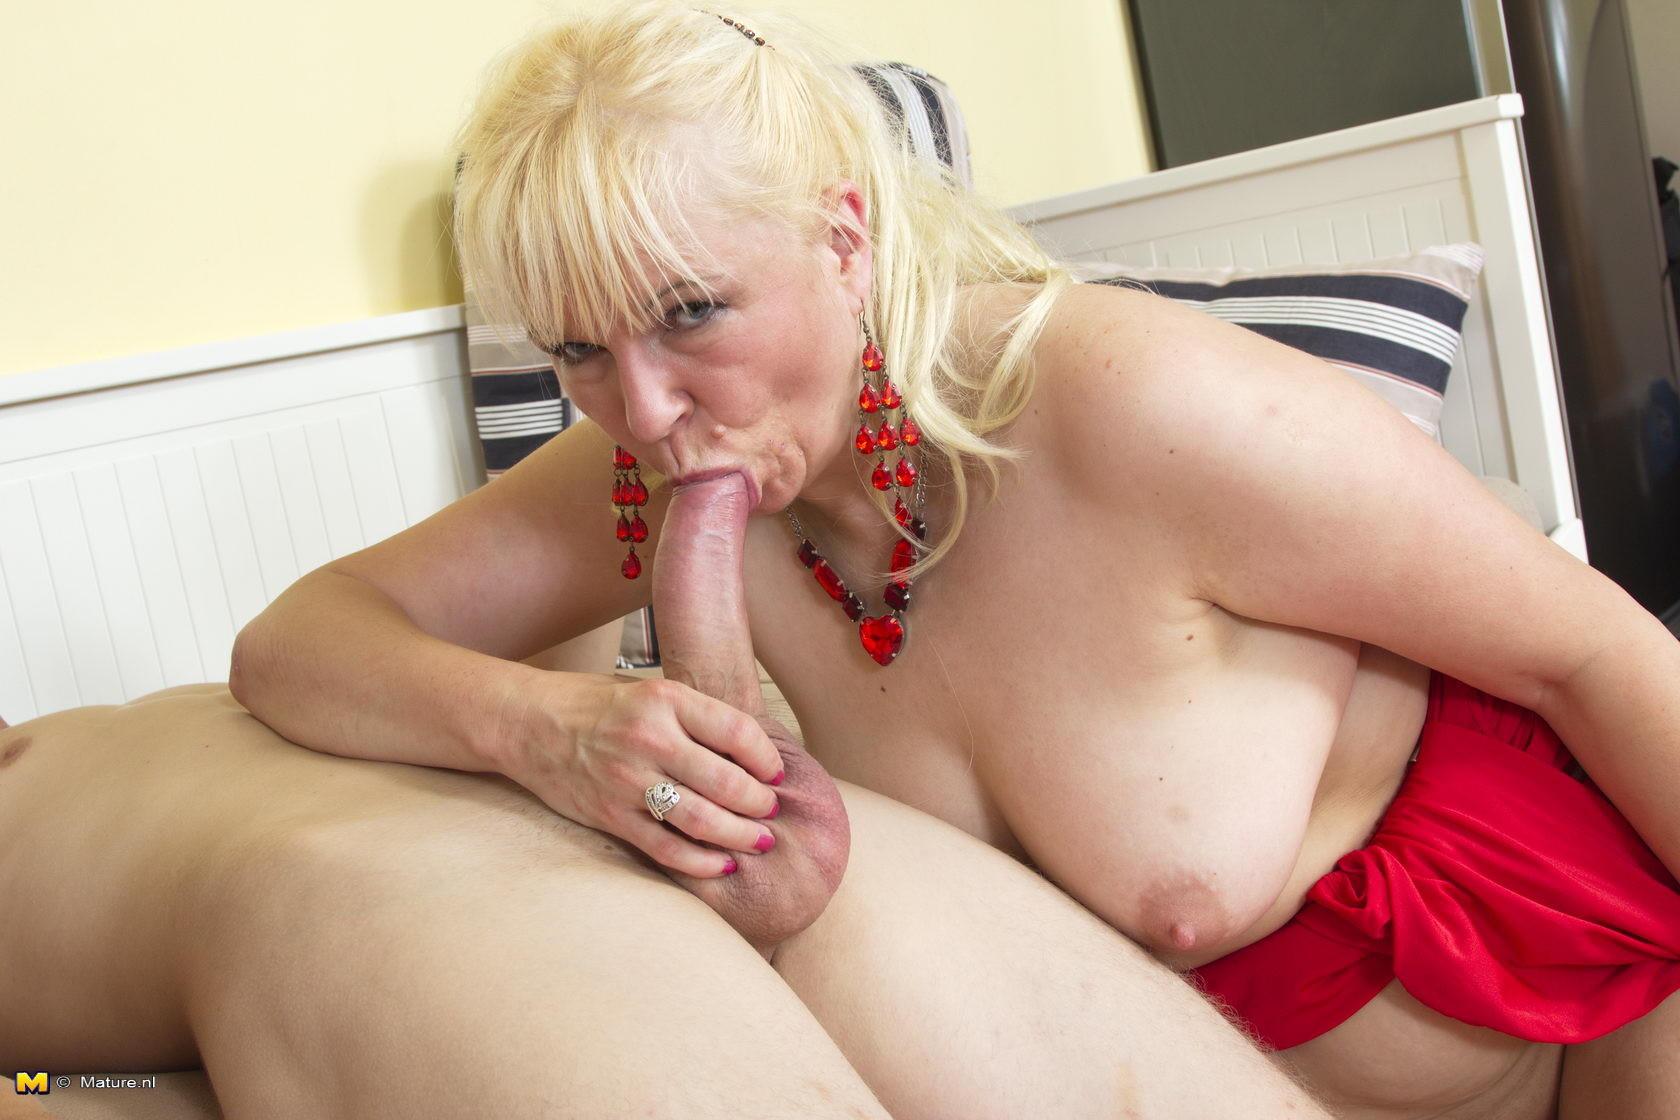 Пухлые - Порно галерея № 3546478